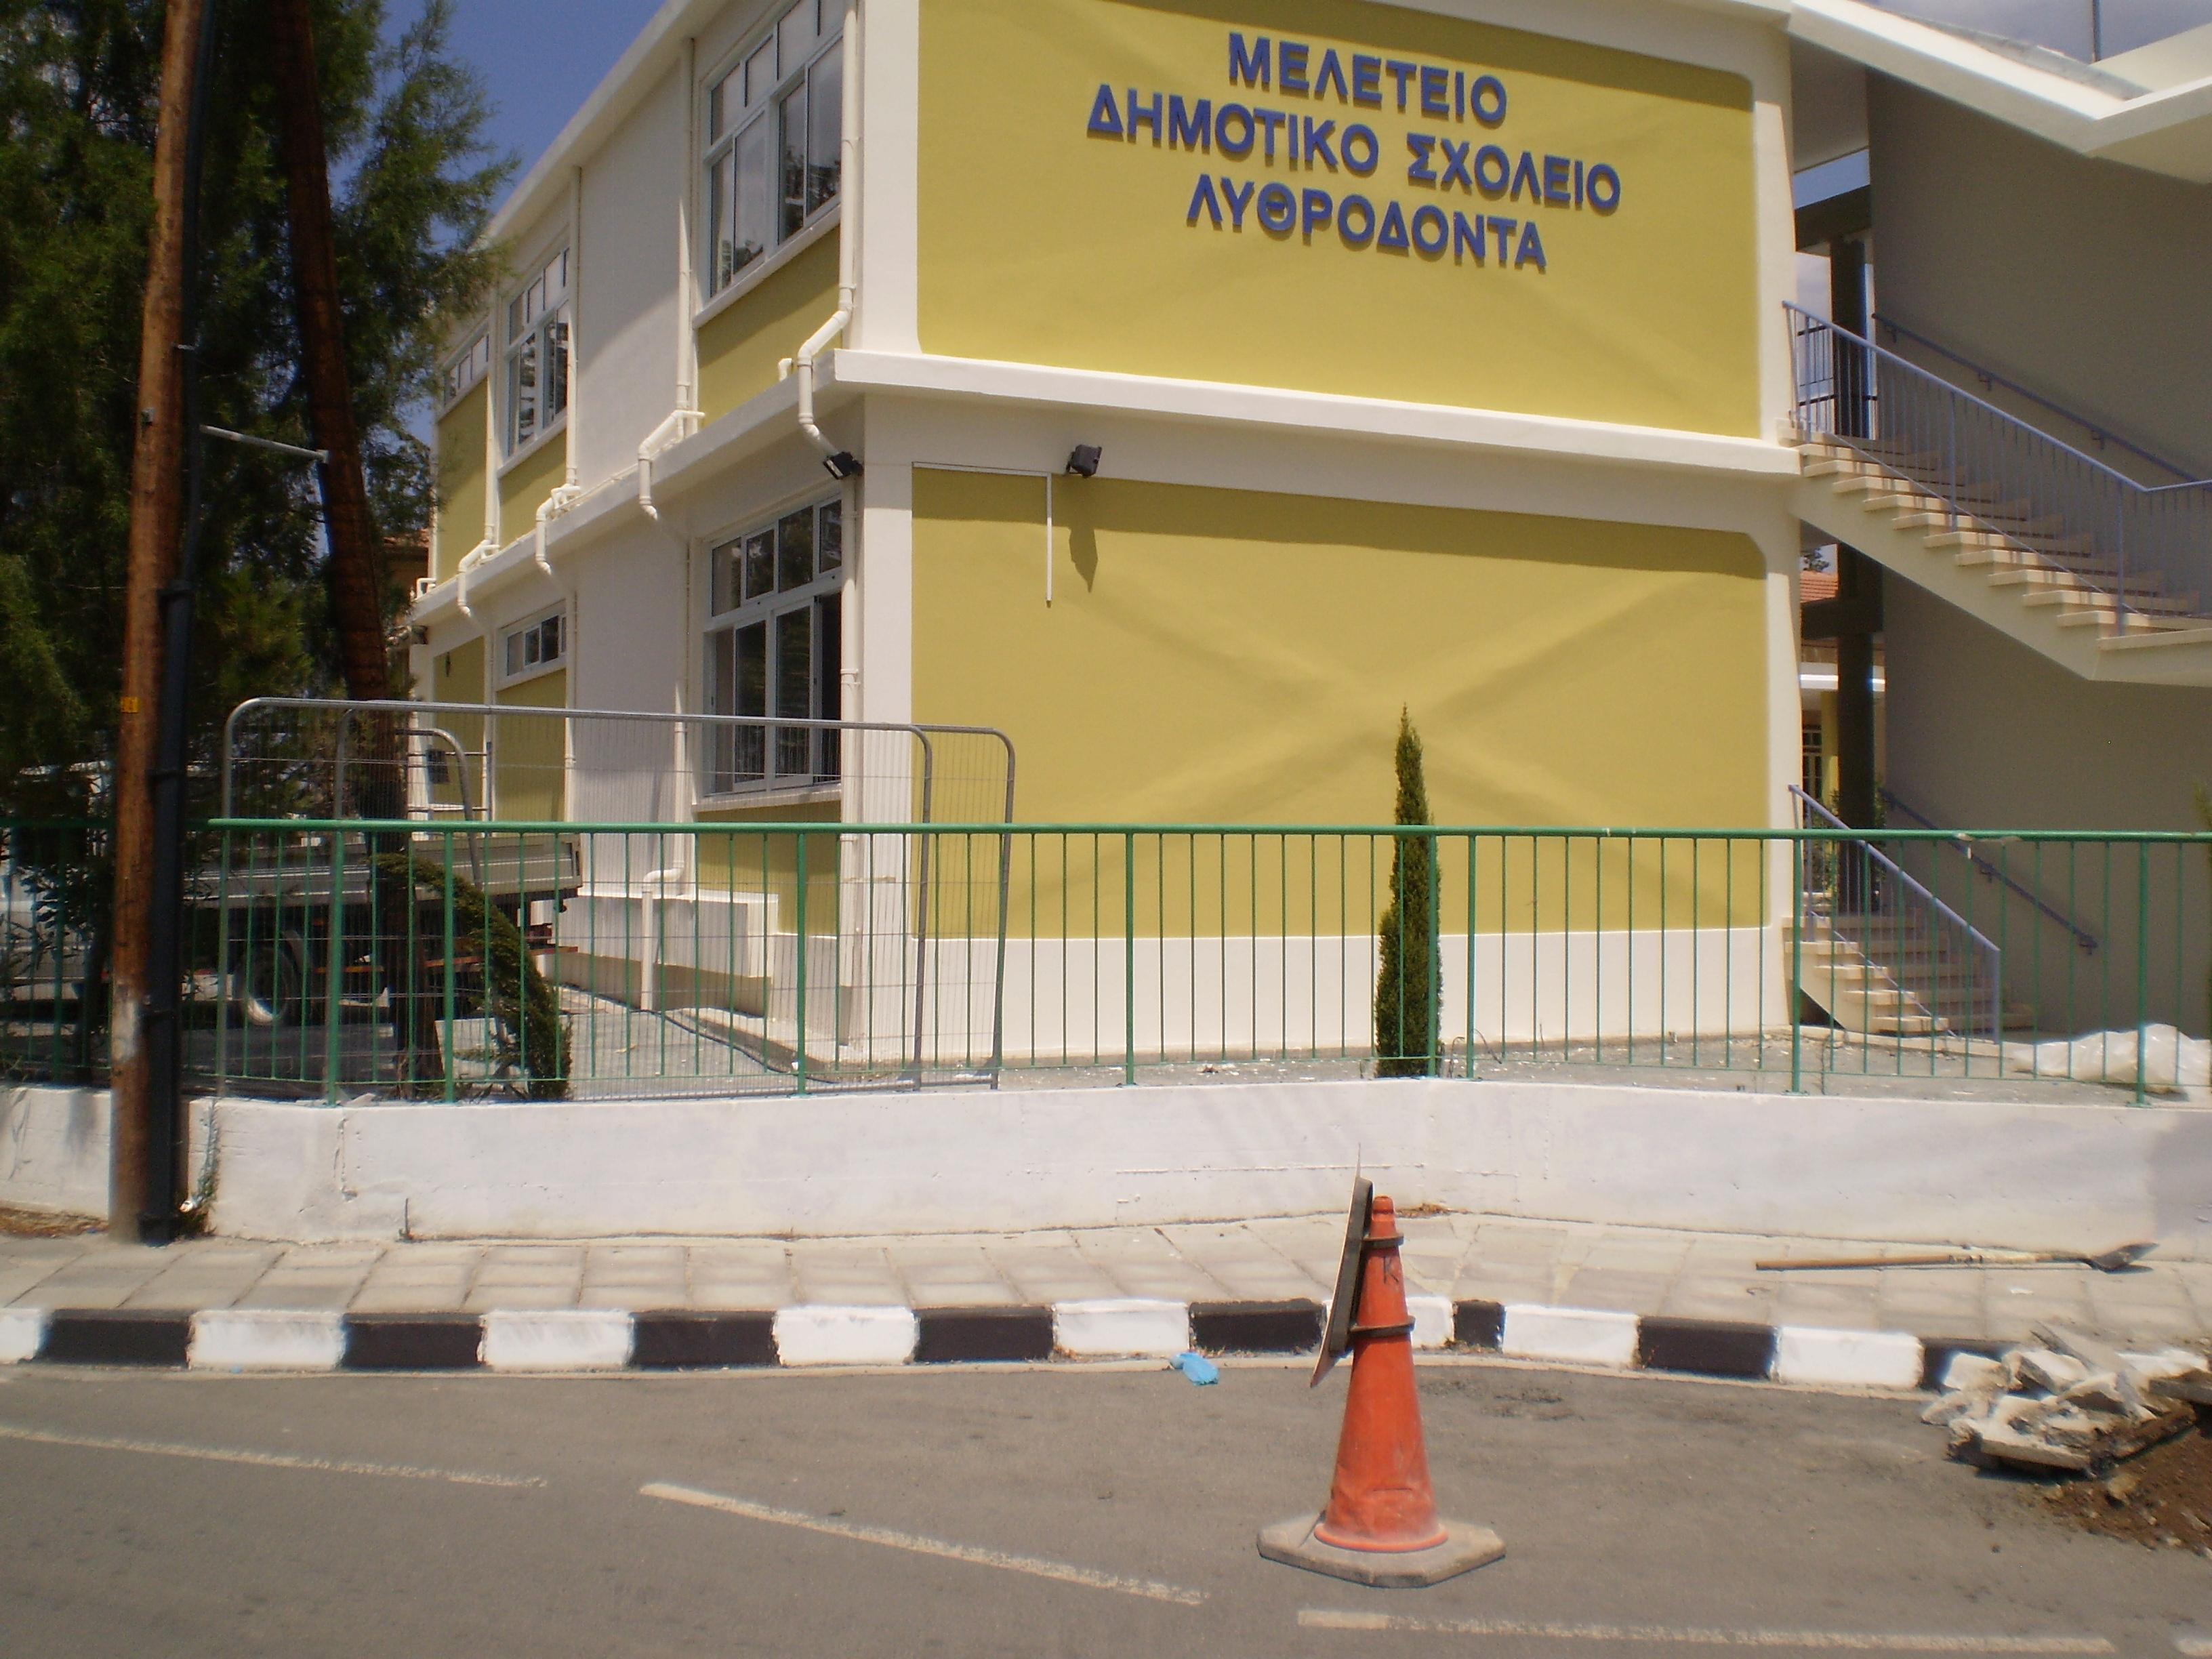 Lythrodontas Primary School